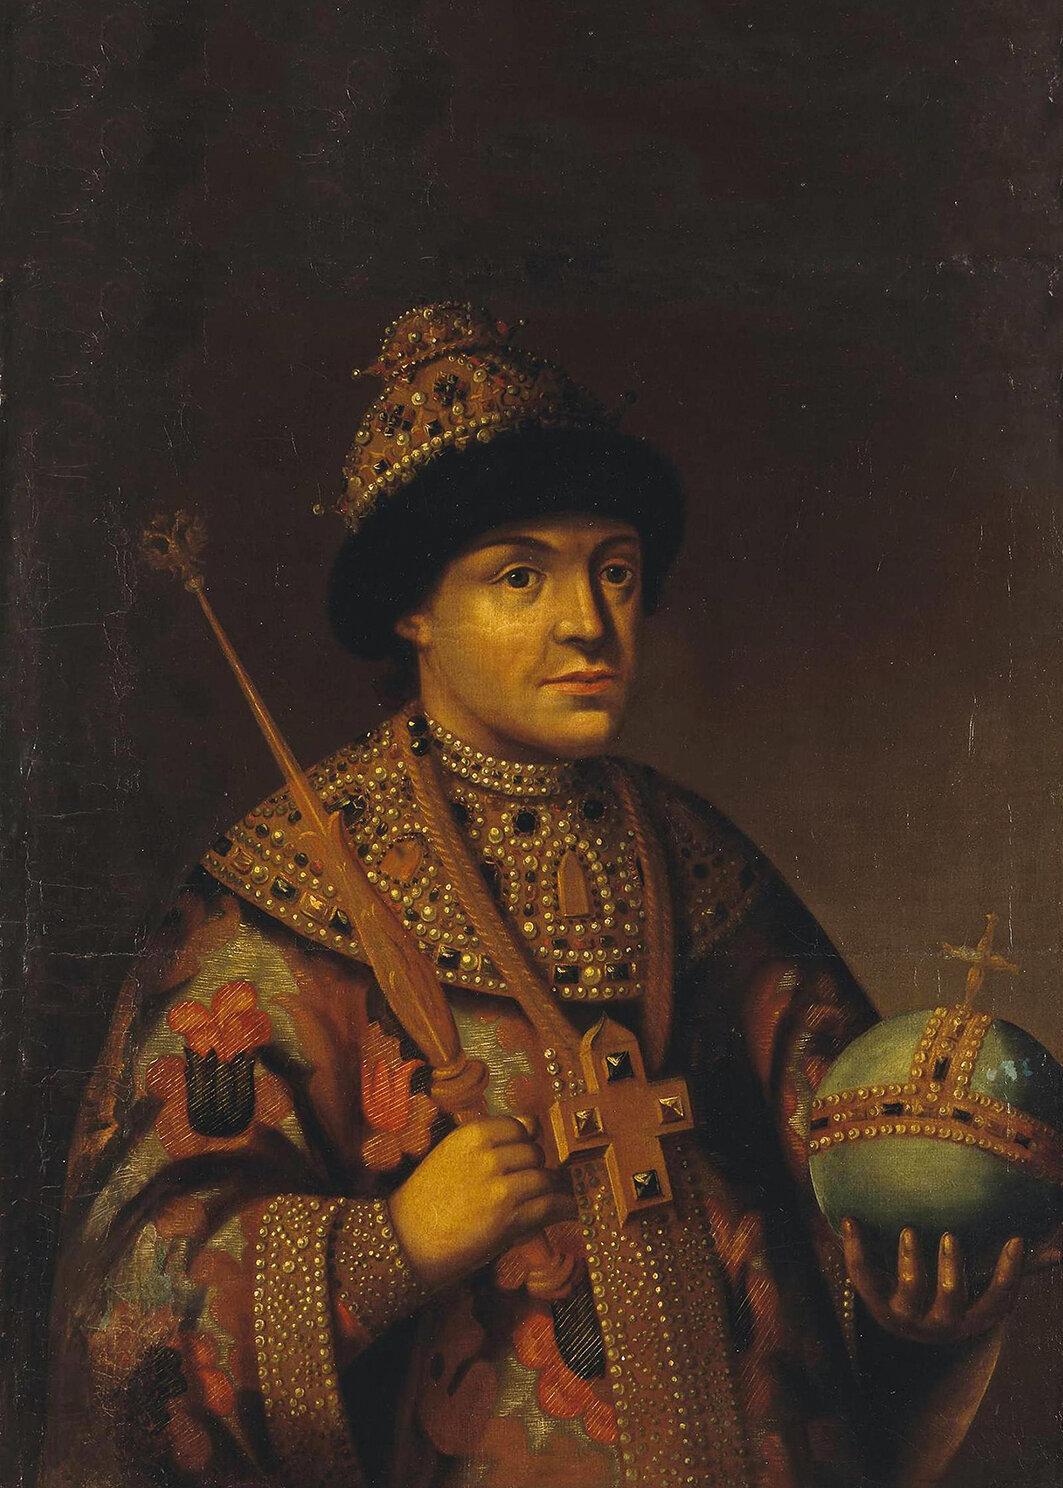 Фёдор Алексеевич Романов, брат Петра I